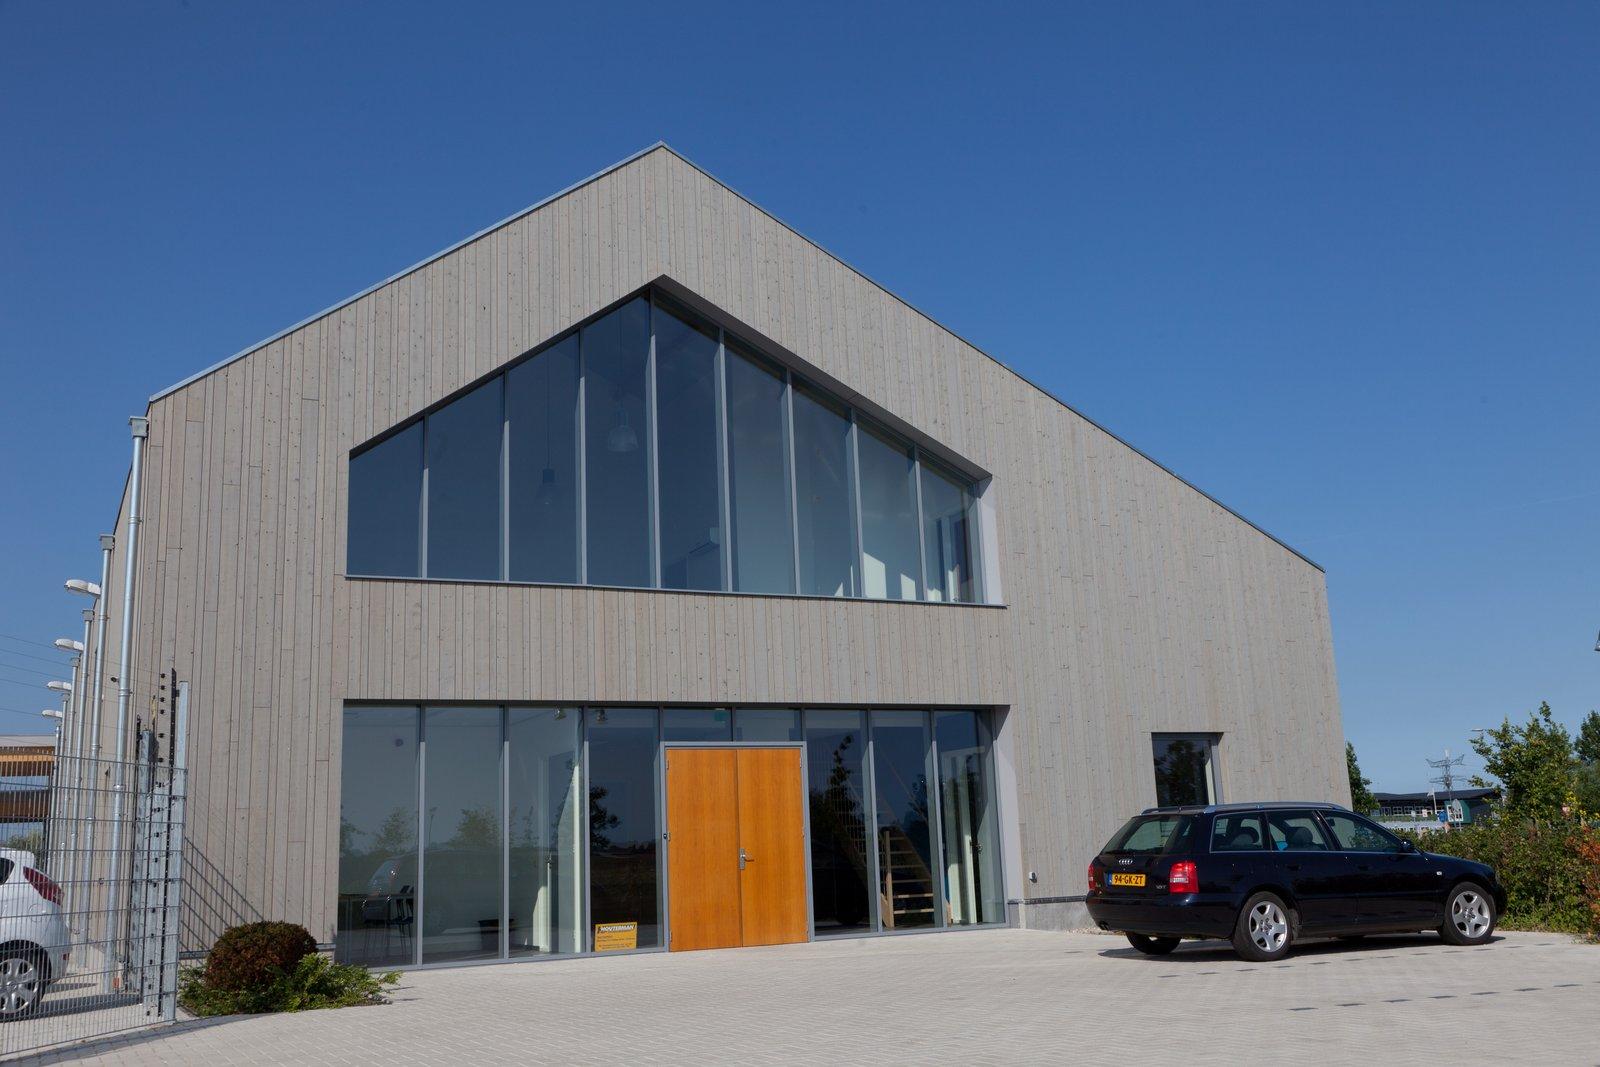 Houterman Autosleepdiensten Oosterhout